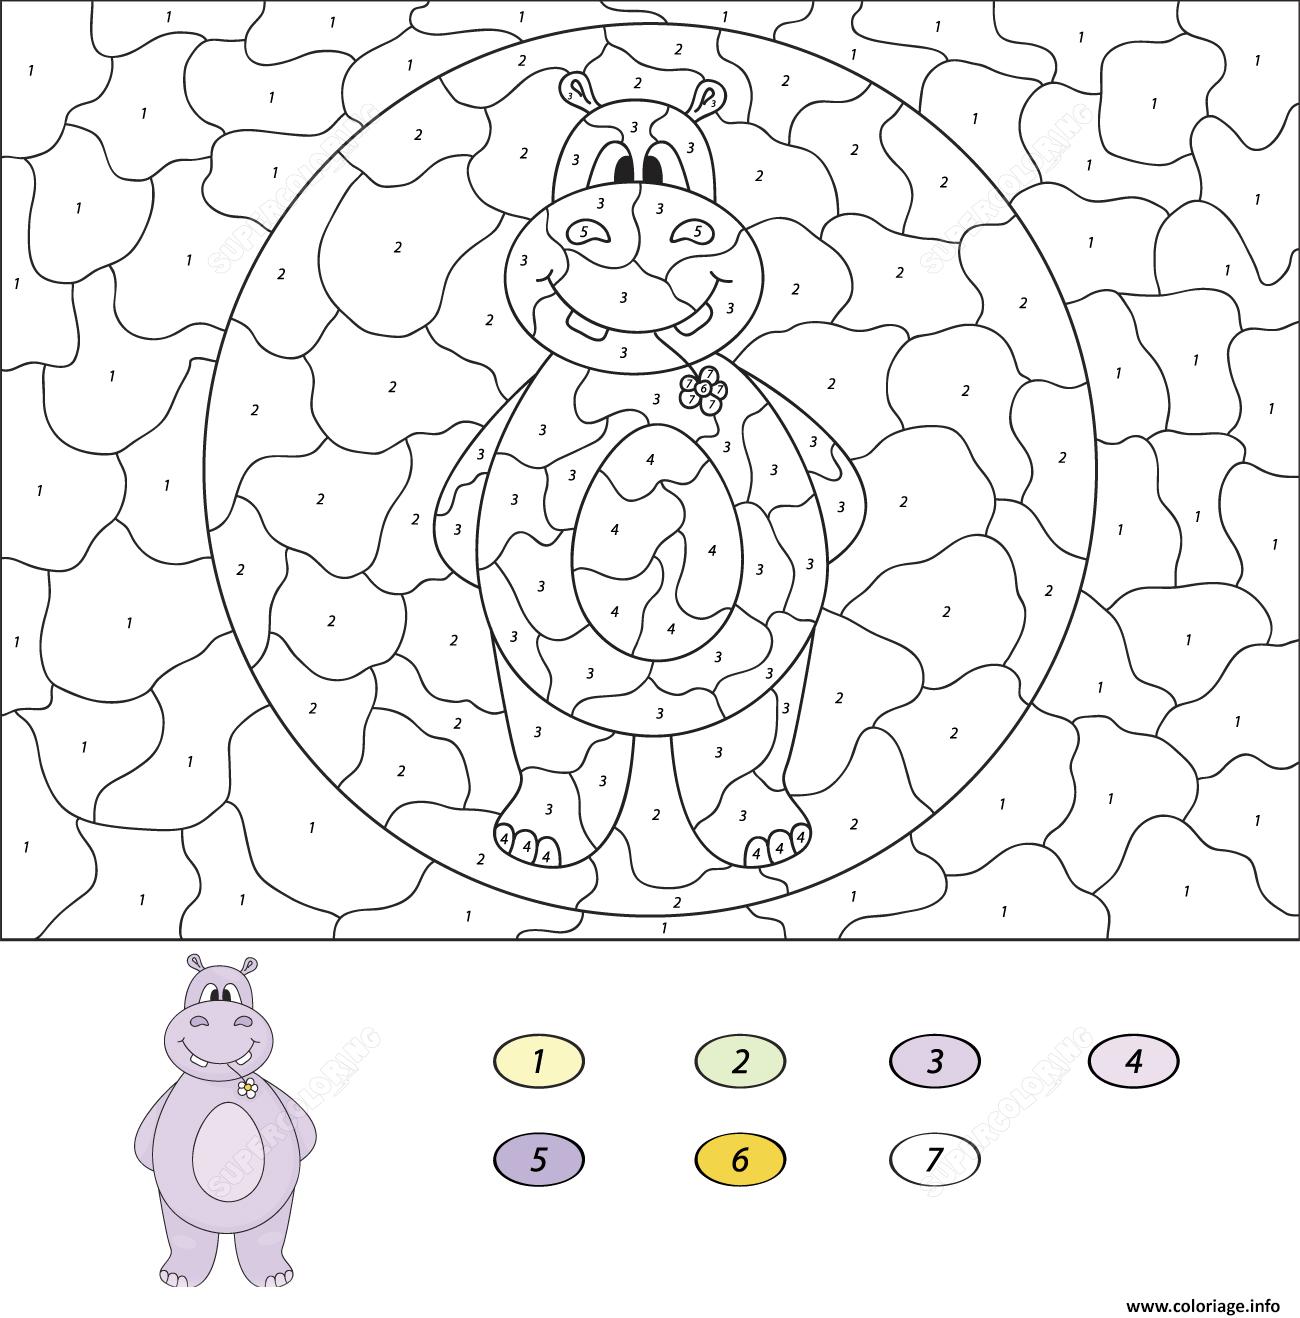 Coloriage Cartoon Hippo Magique